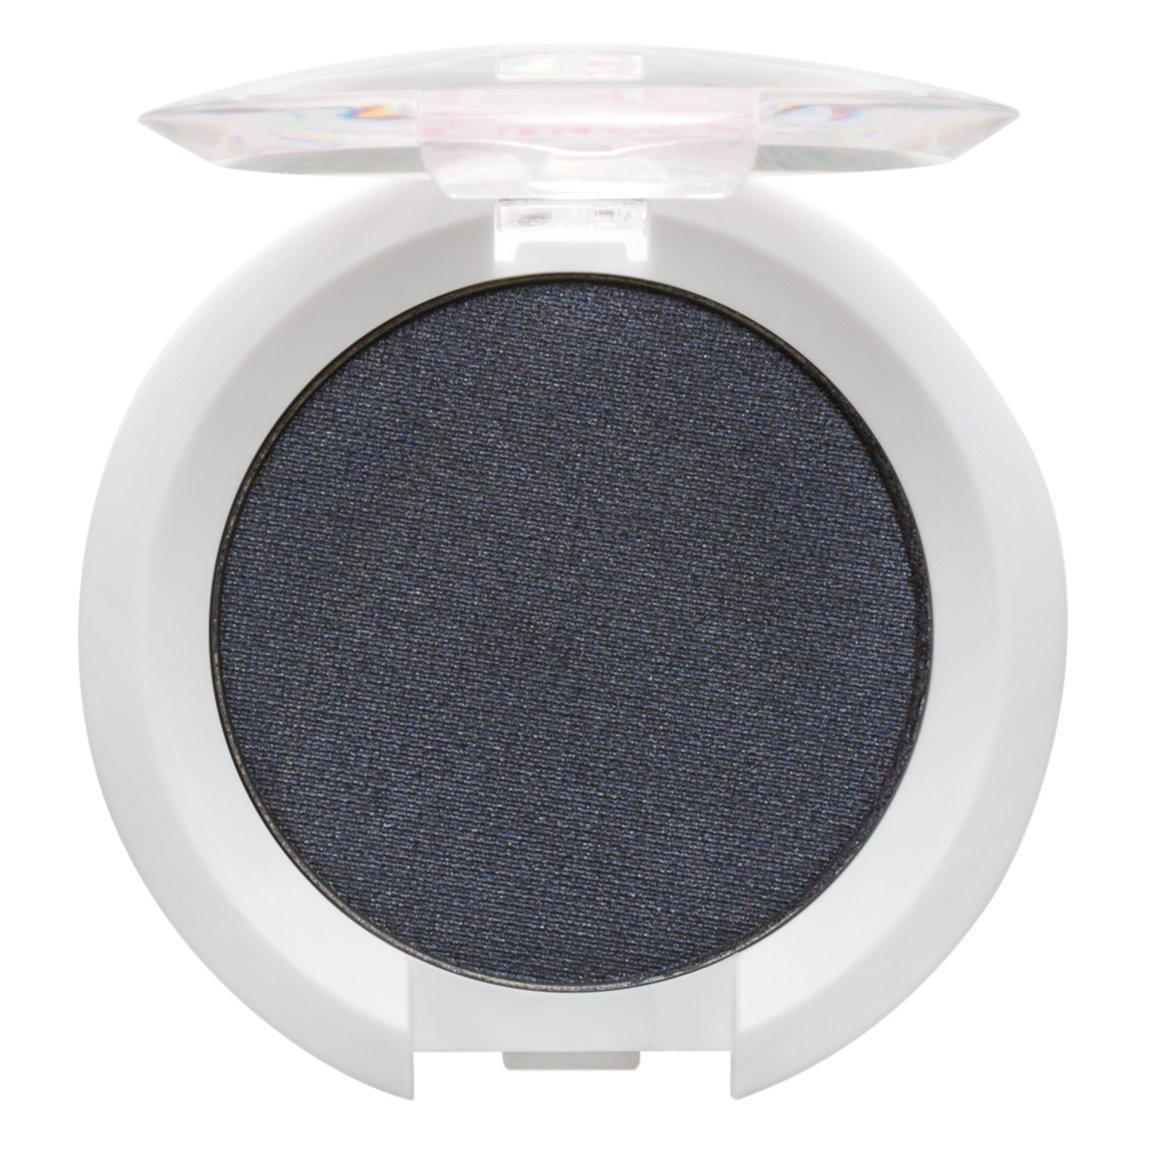 Sugarpill Pressed Eyeshadow The Inventor (grey)